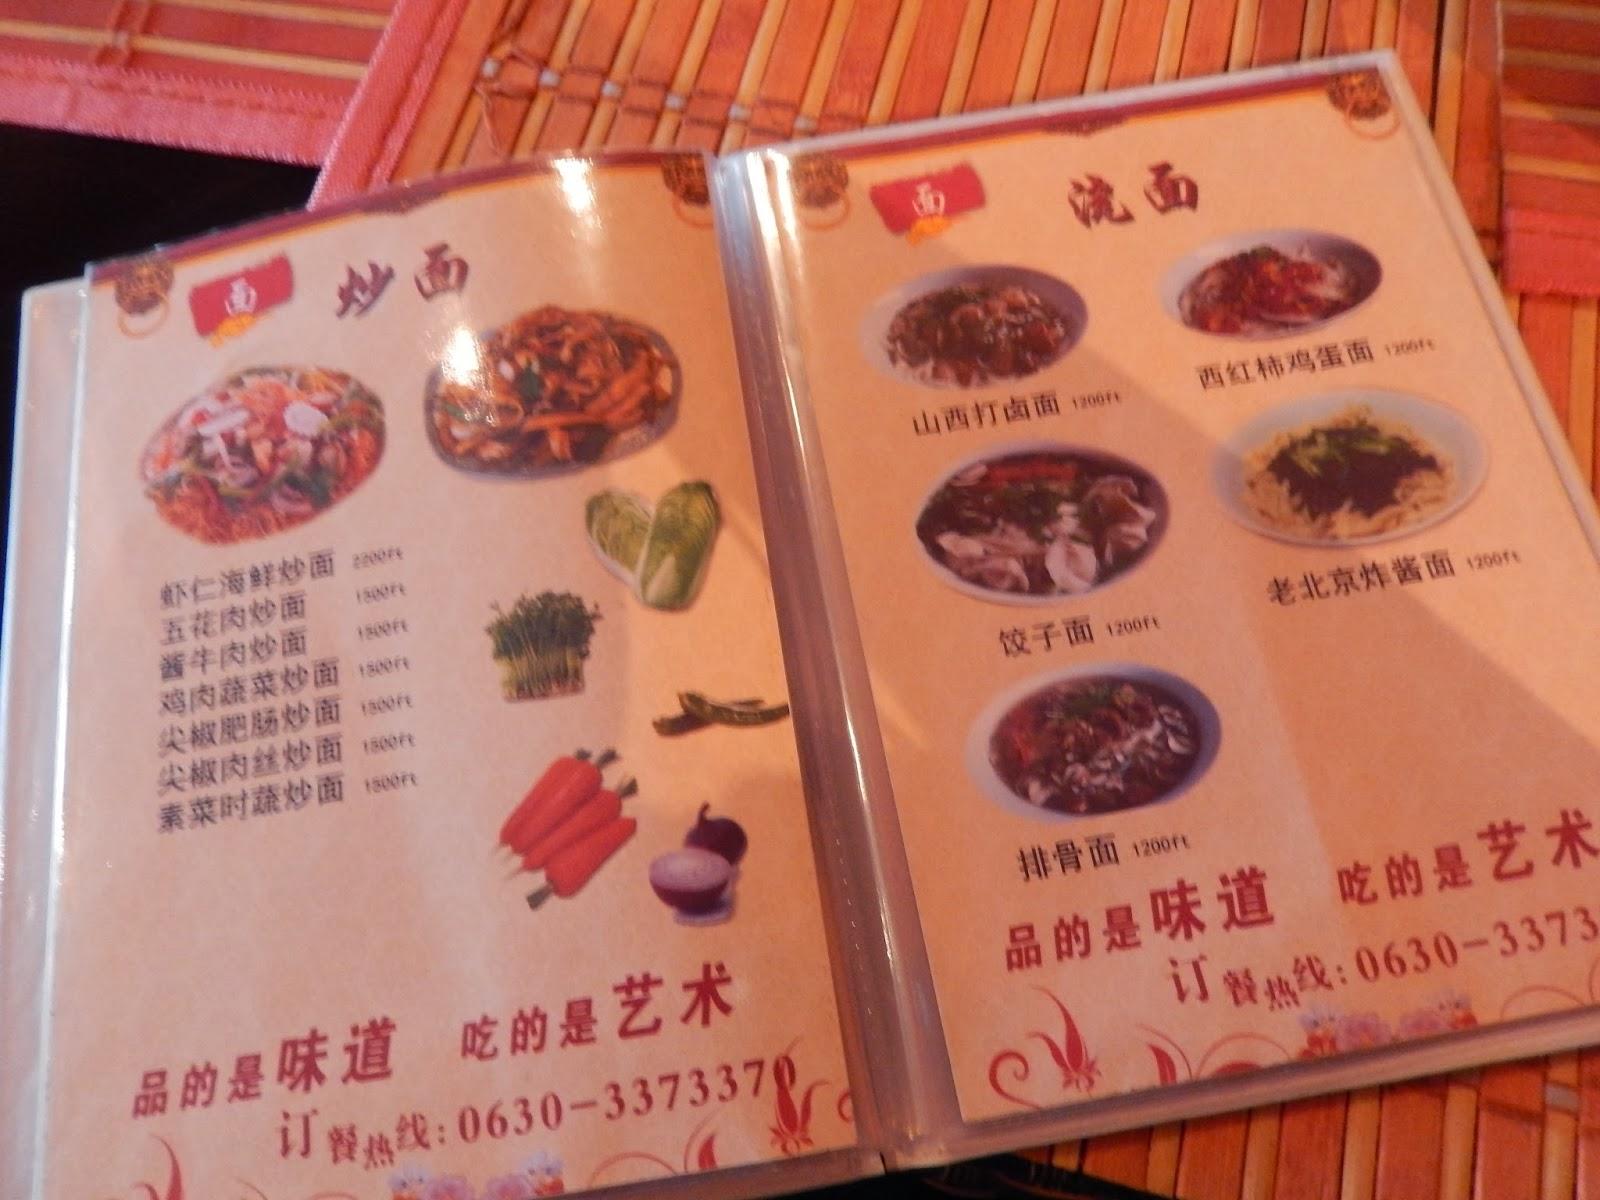 Anus the menus